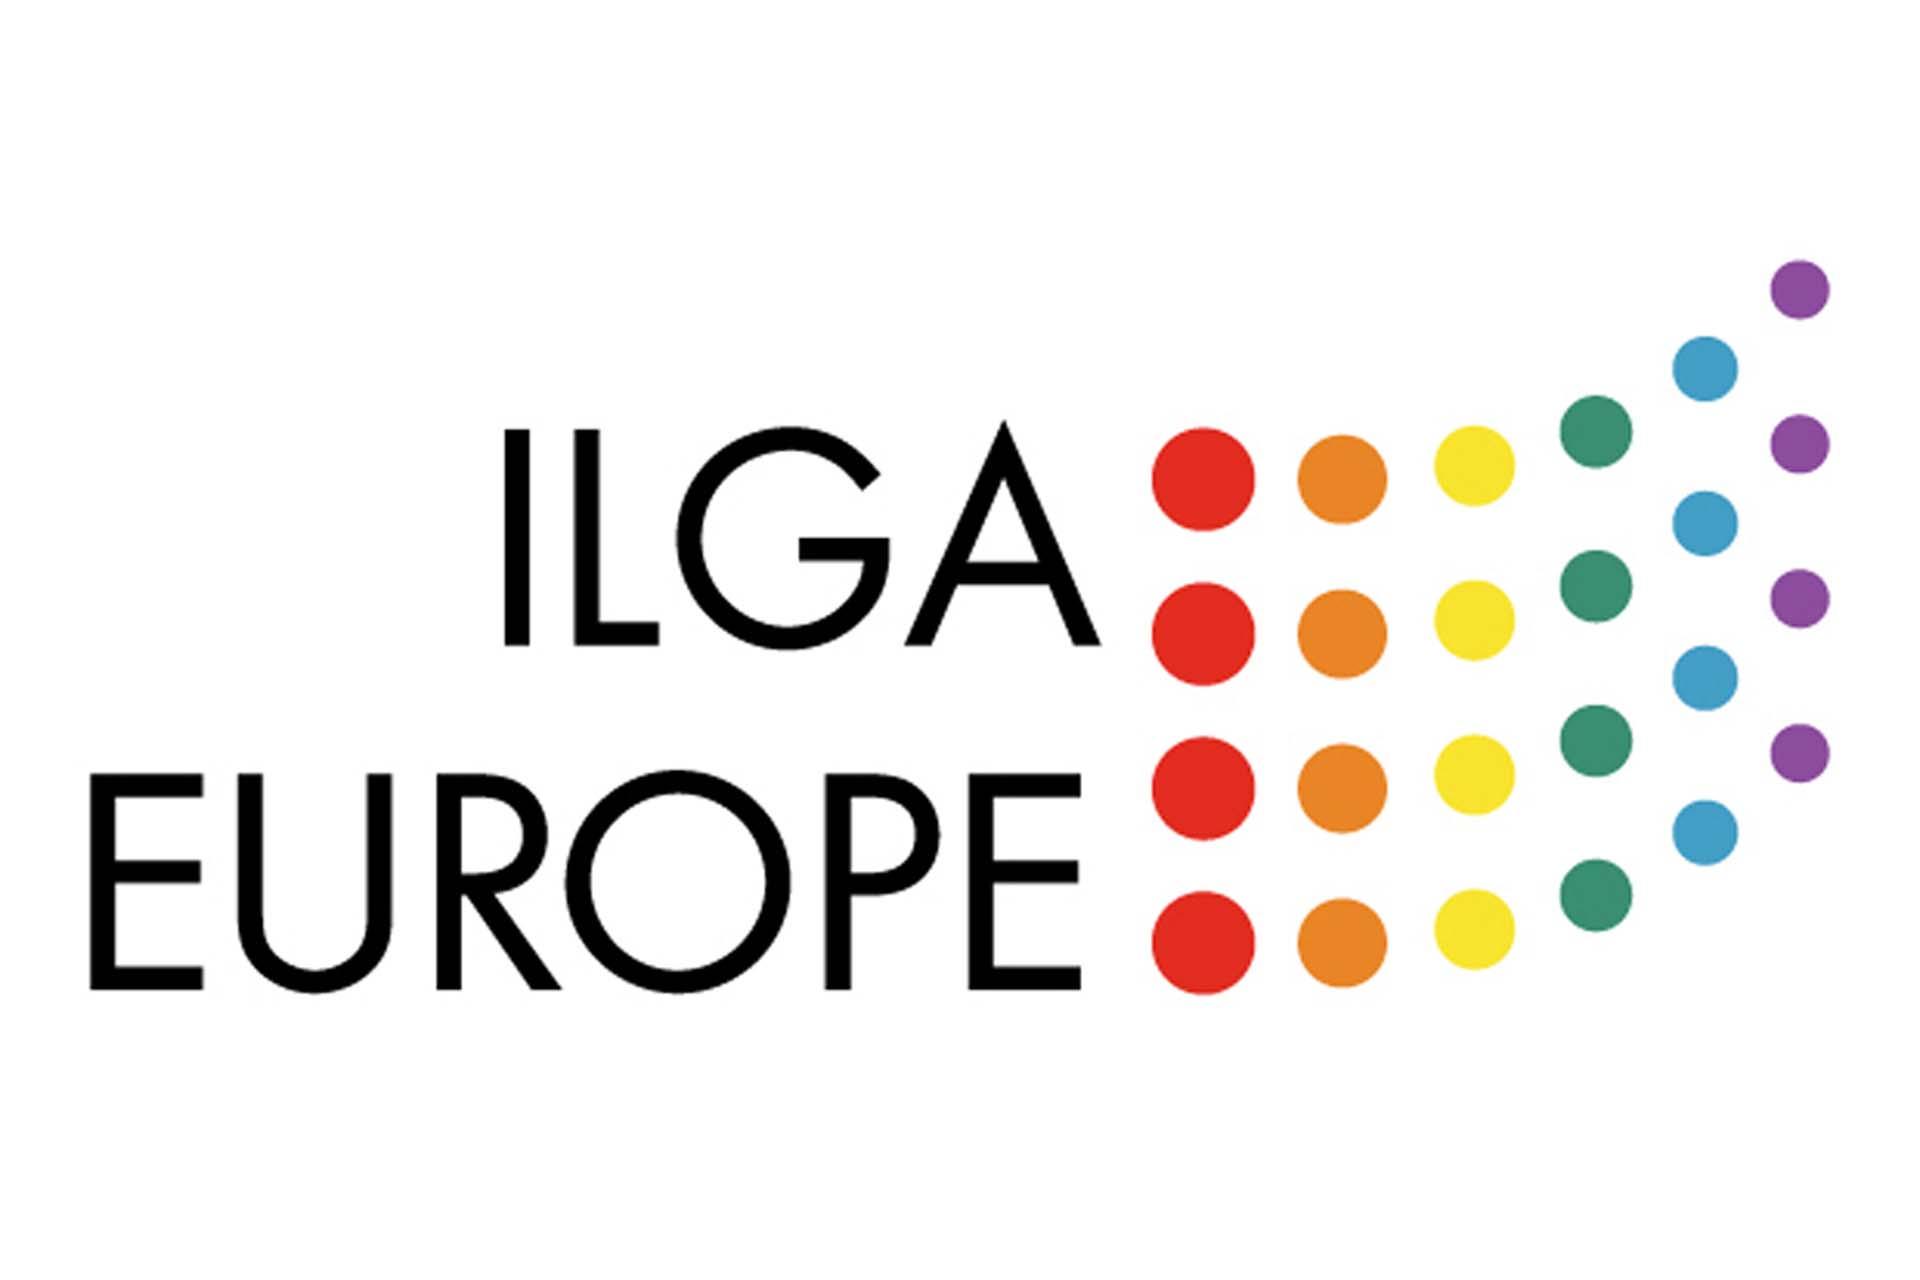 Logo ILGA Europe